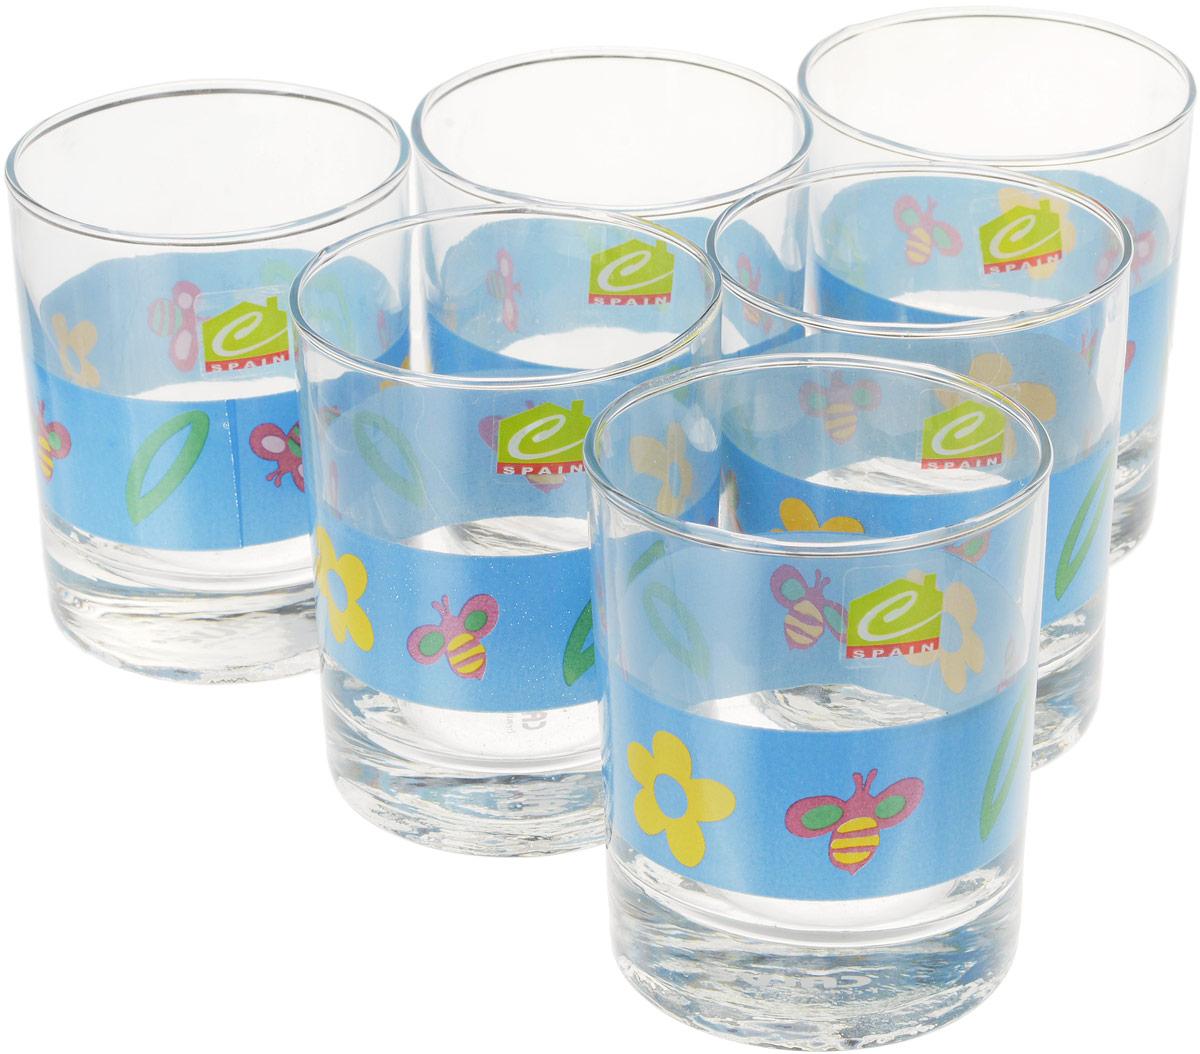 Набор стаканов Calve, цвет: синий 280 мл, 6 шт каталог calve цена